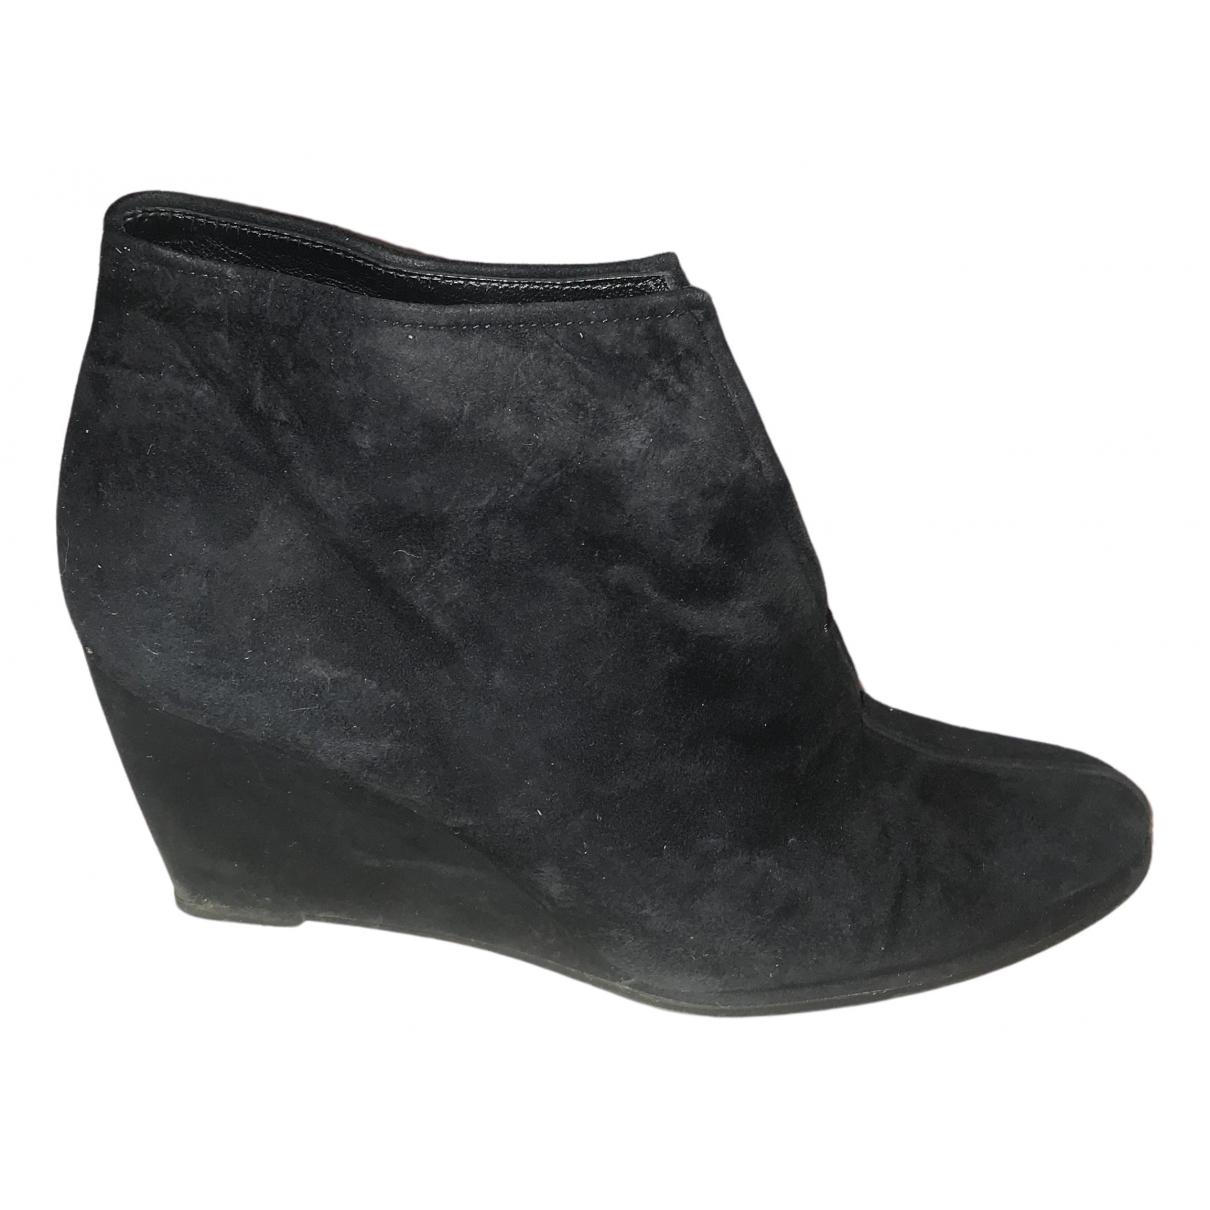 Stuart Weitzman \N Black Suede Ankle boots for Women 5 UK